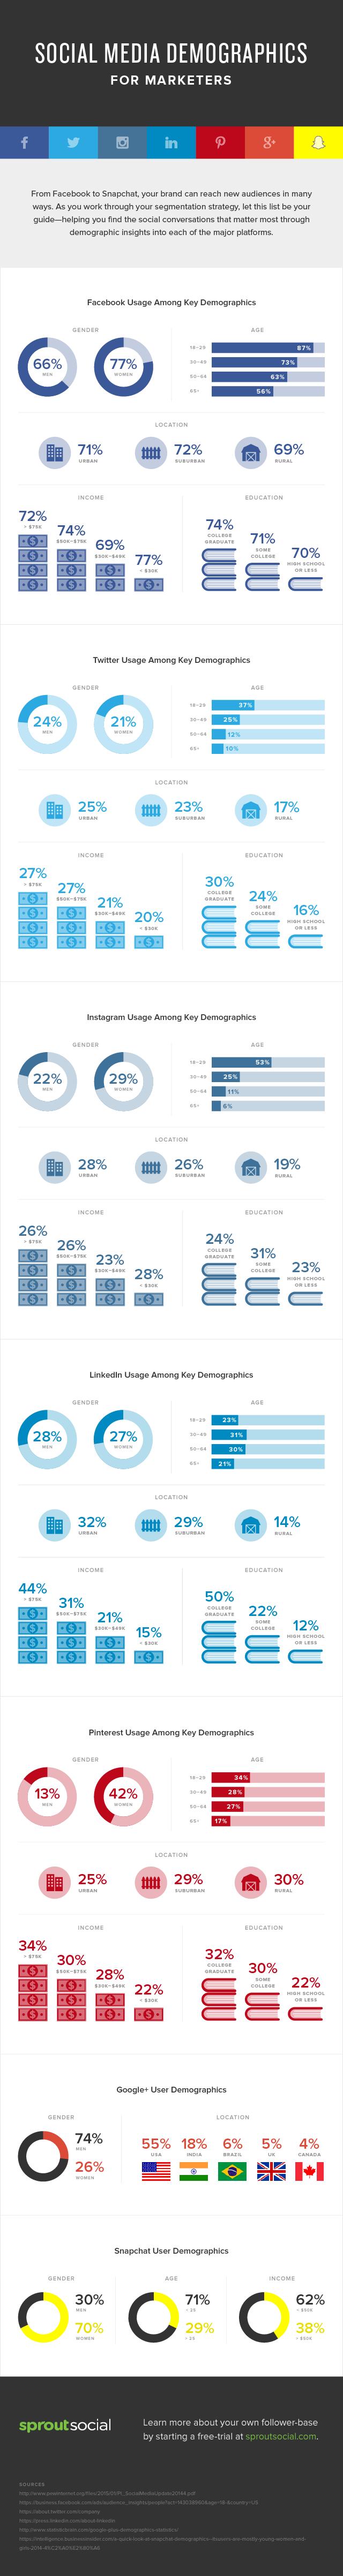 social networking demographics